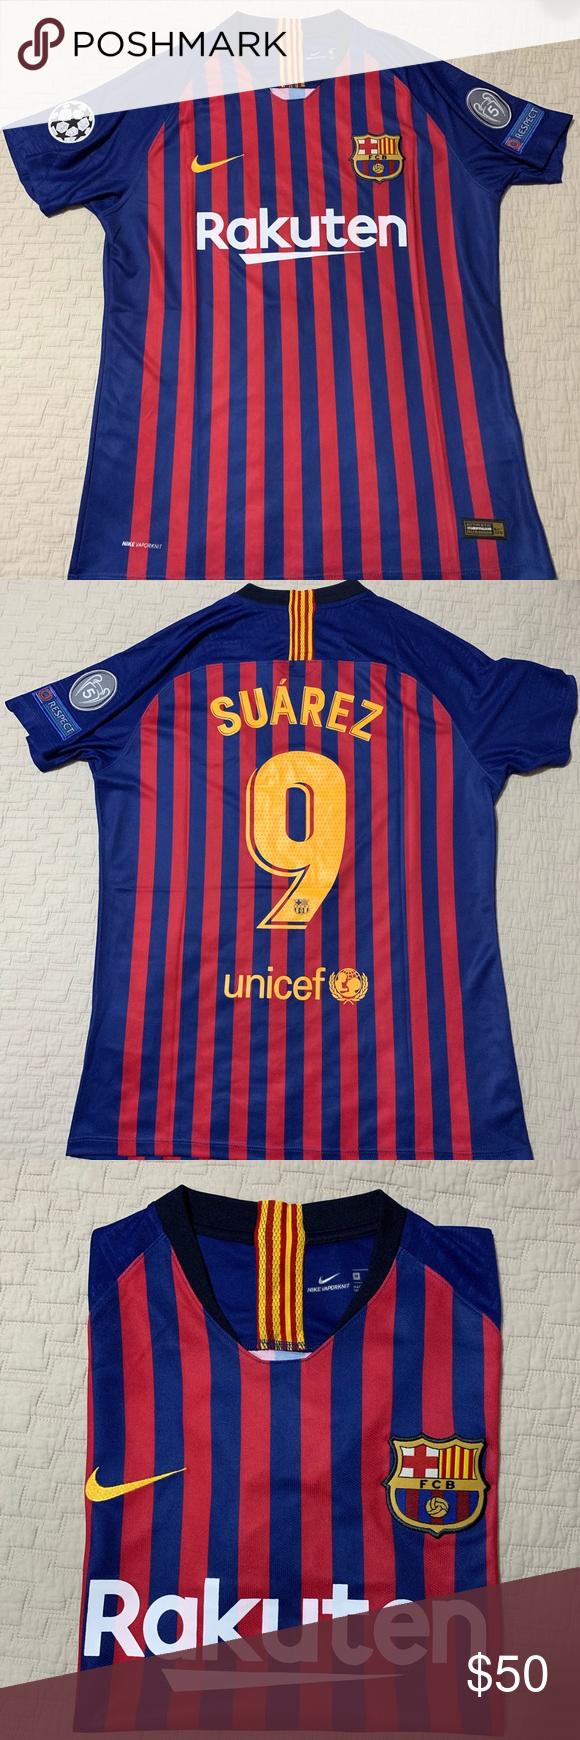 best cheap 25499 8c0e6 Nike Barcelona jersey Nike Barcelona 2018-19 home jersey ...